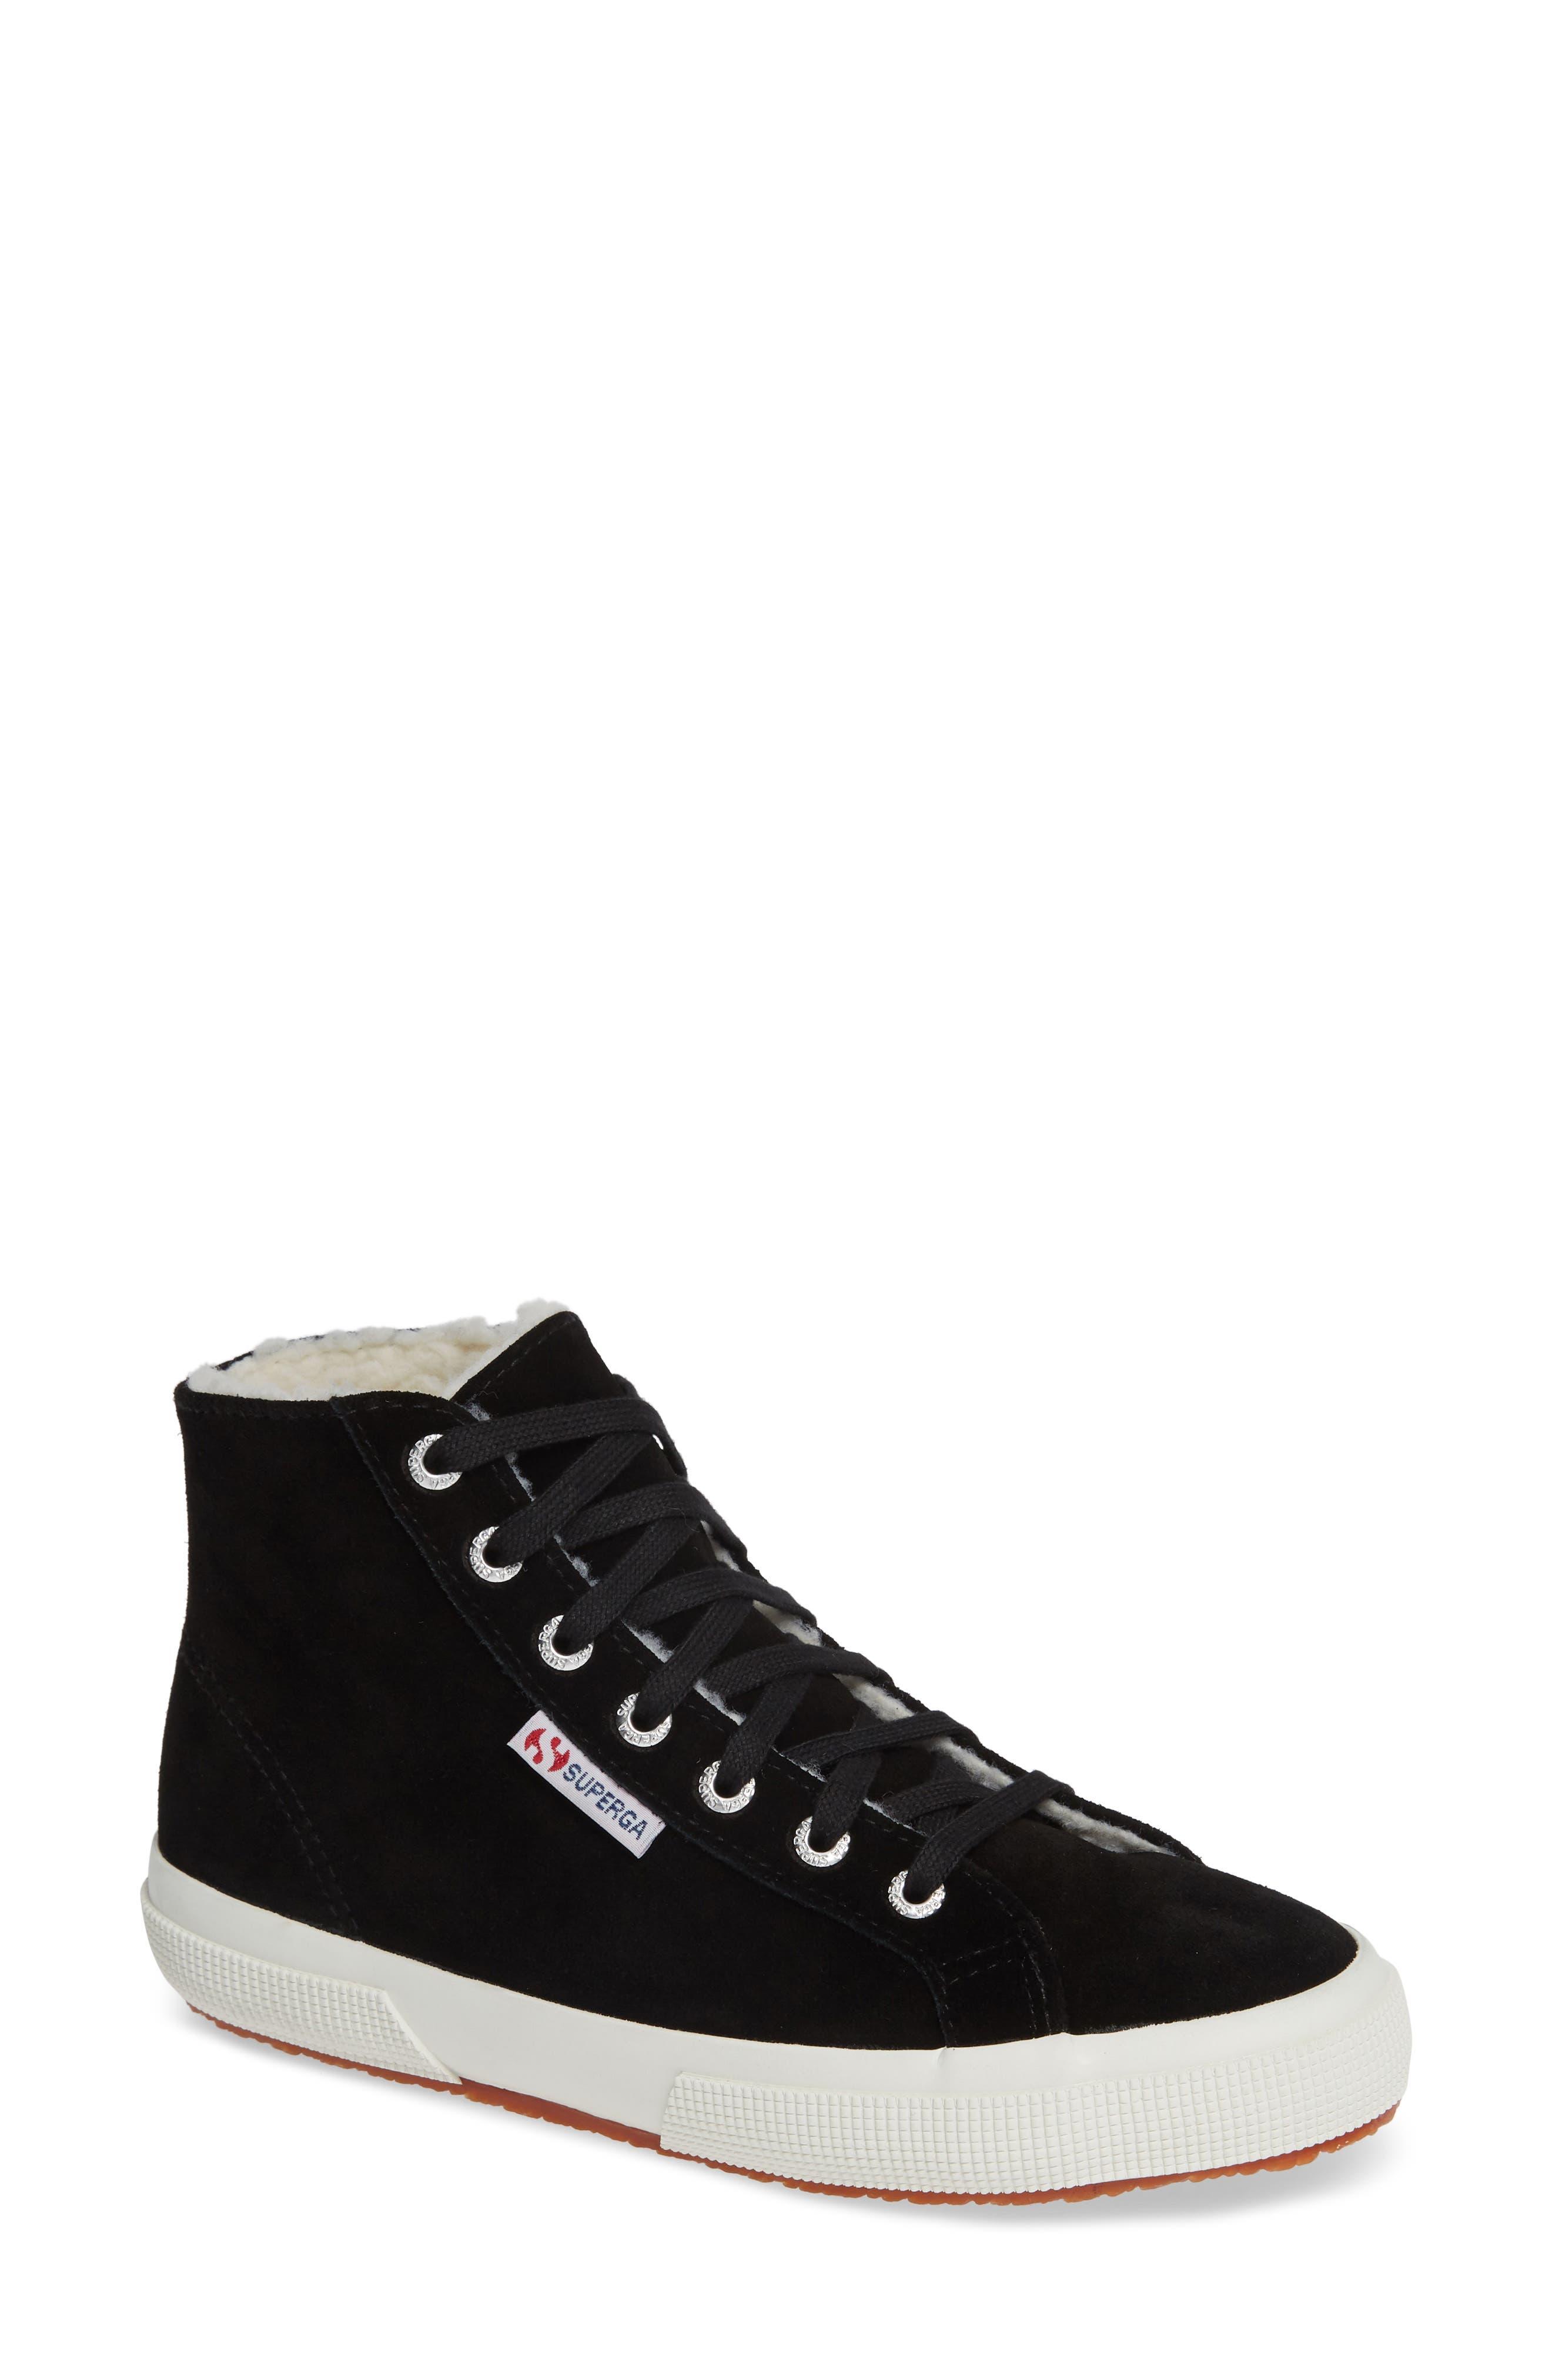 2795 Suefurw High Top Sneaker,                         Main,                         color, BLACK SUEDE